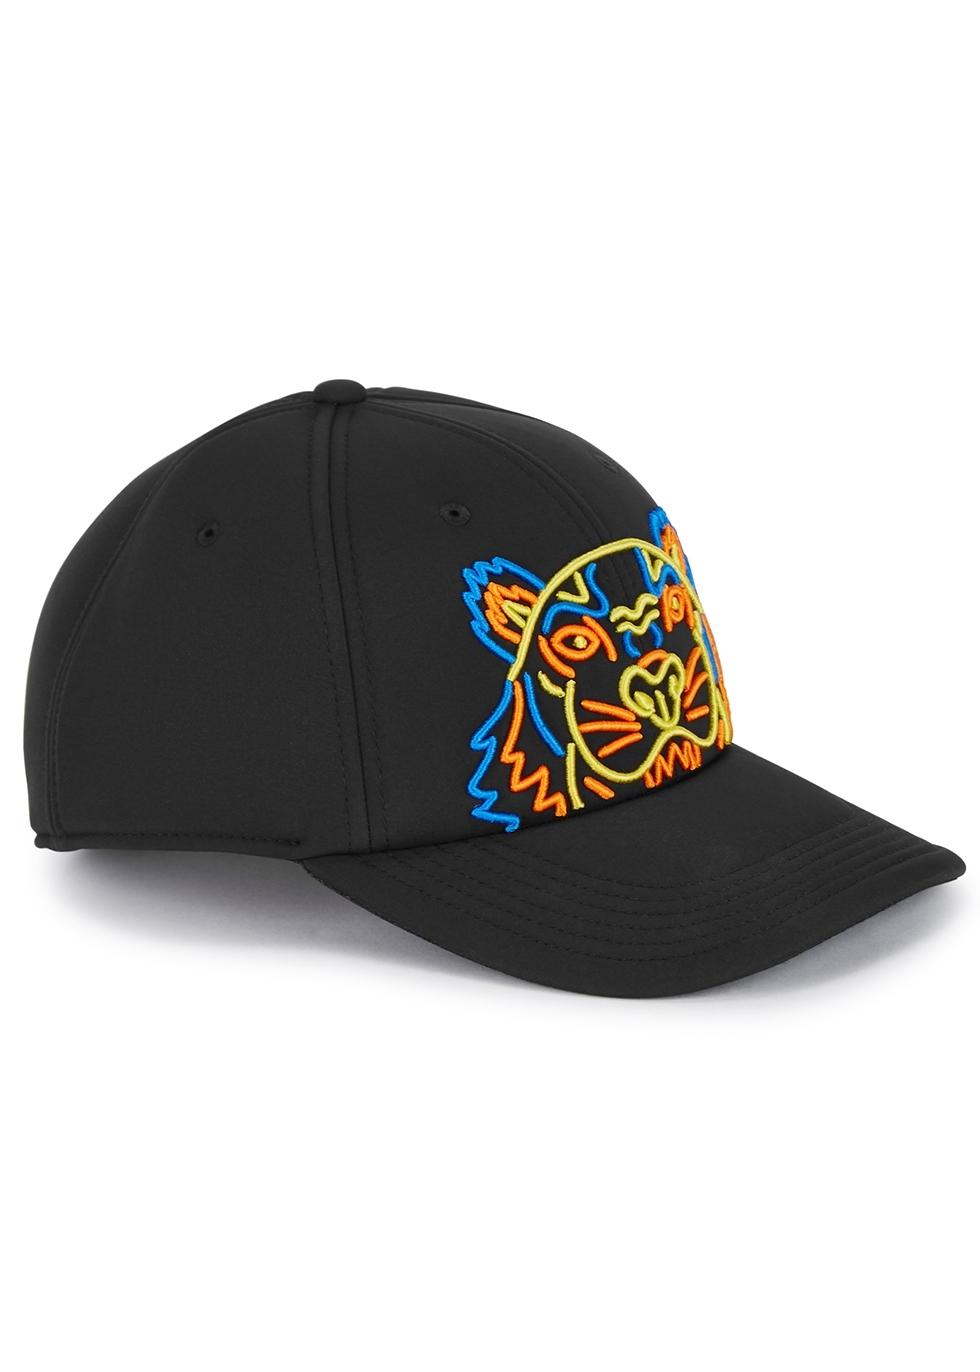 1f90022df3ddd Men s Designer Hats - Harvey Nichols